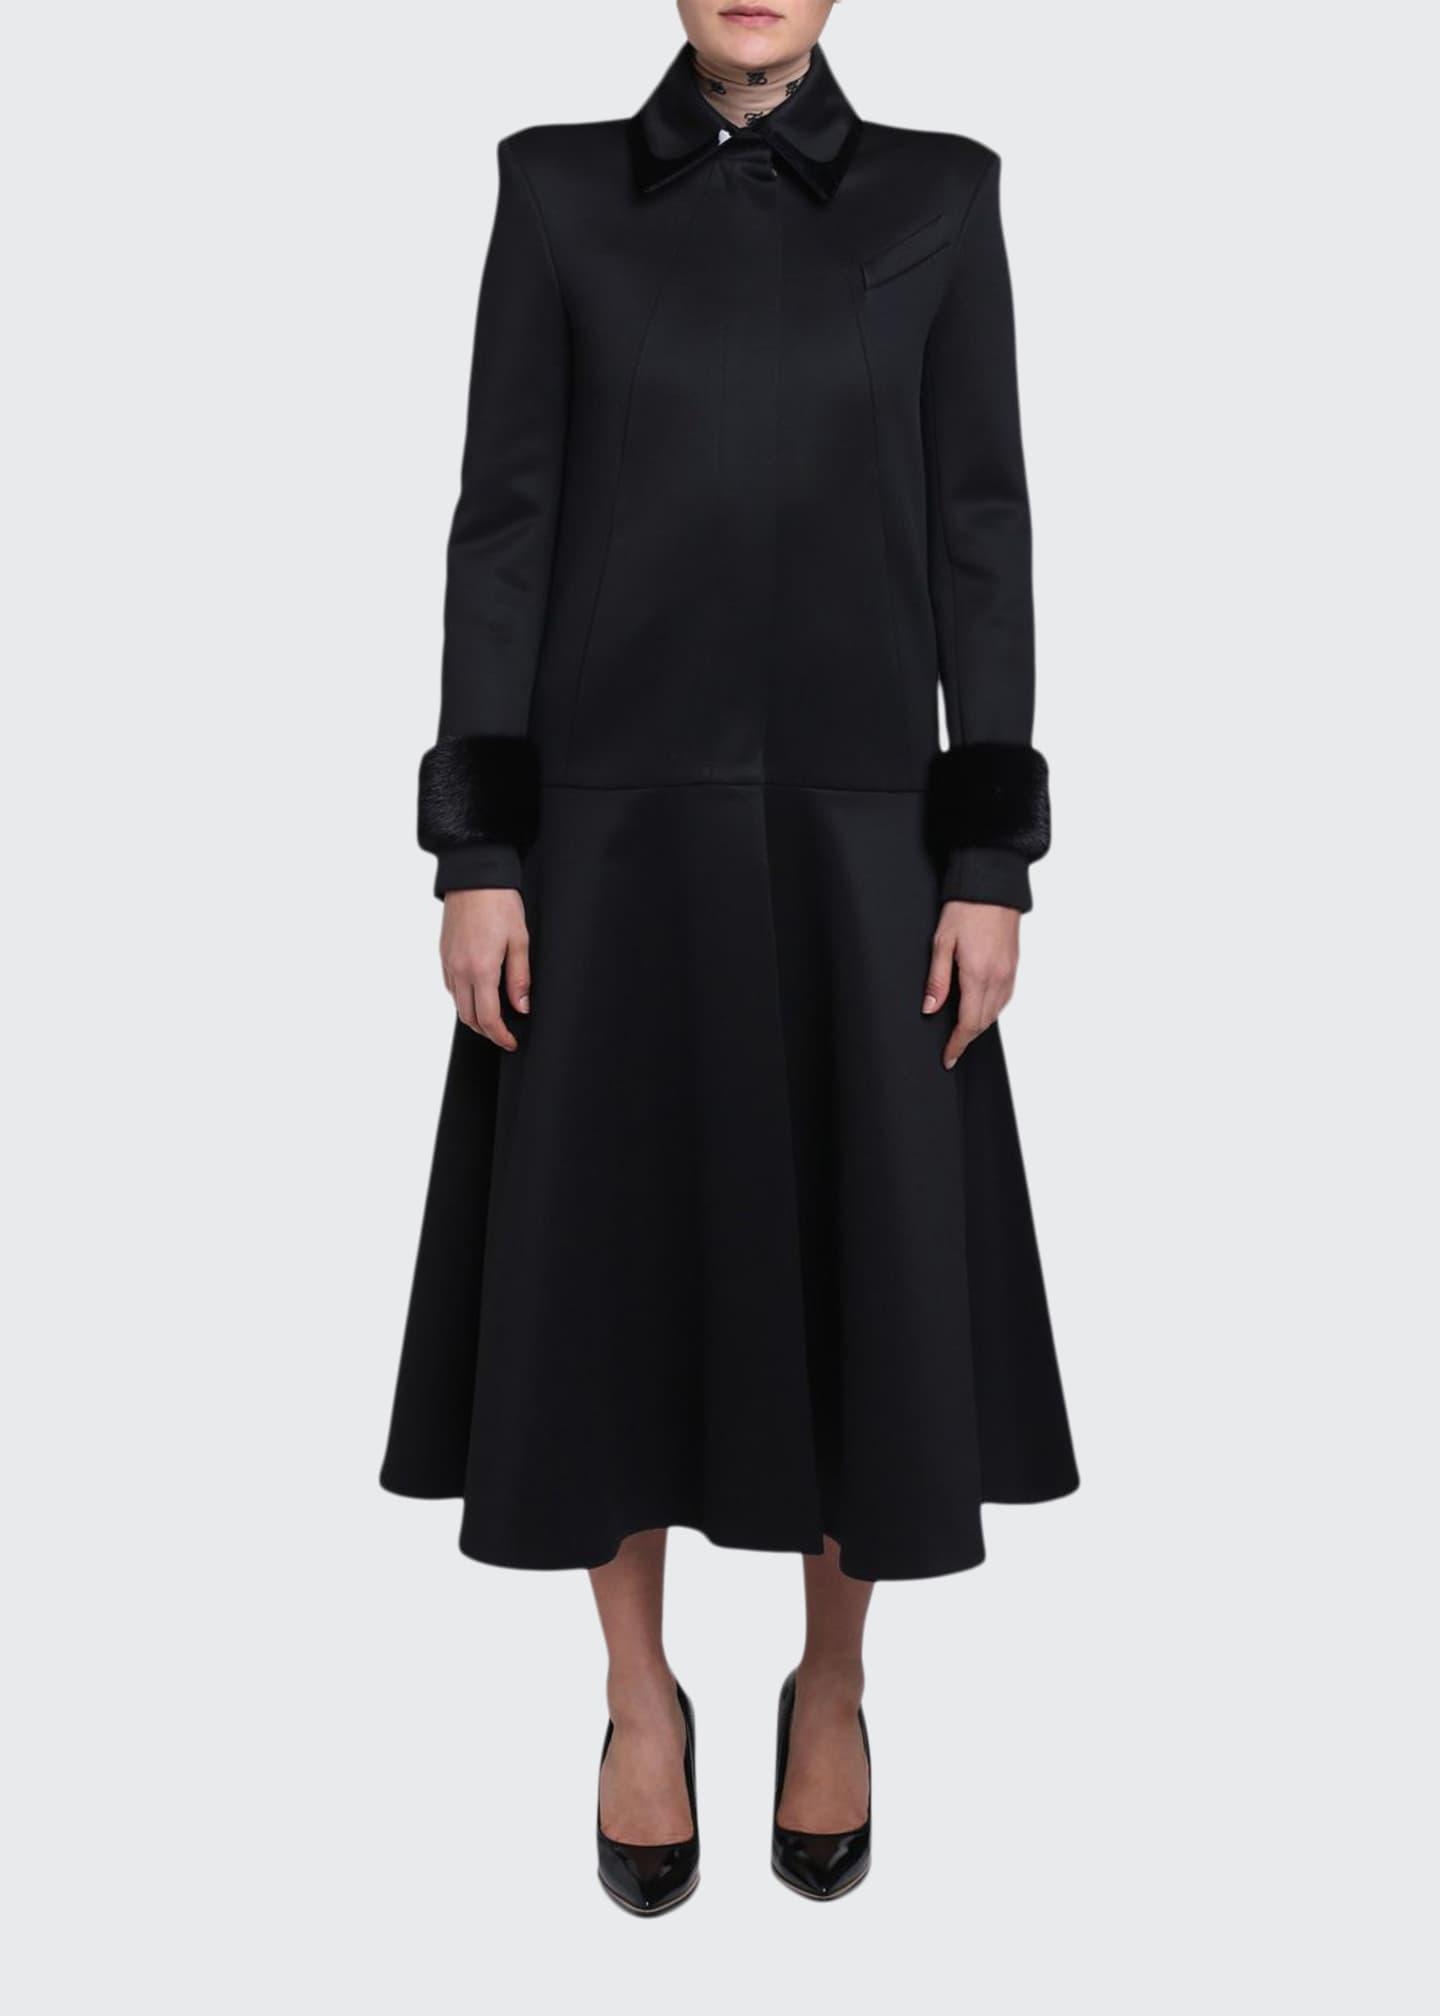 Fendi Mink-Cuff Compact Jersey Coat